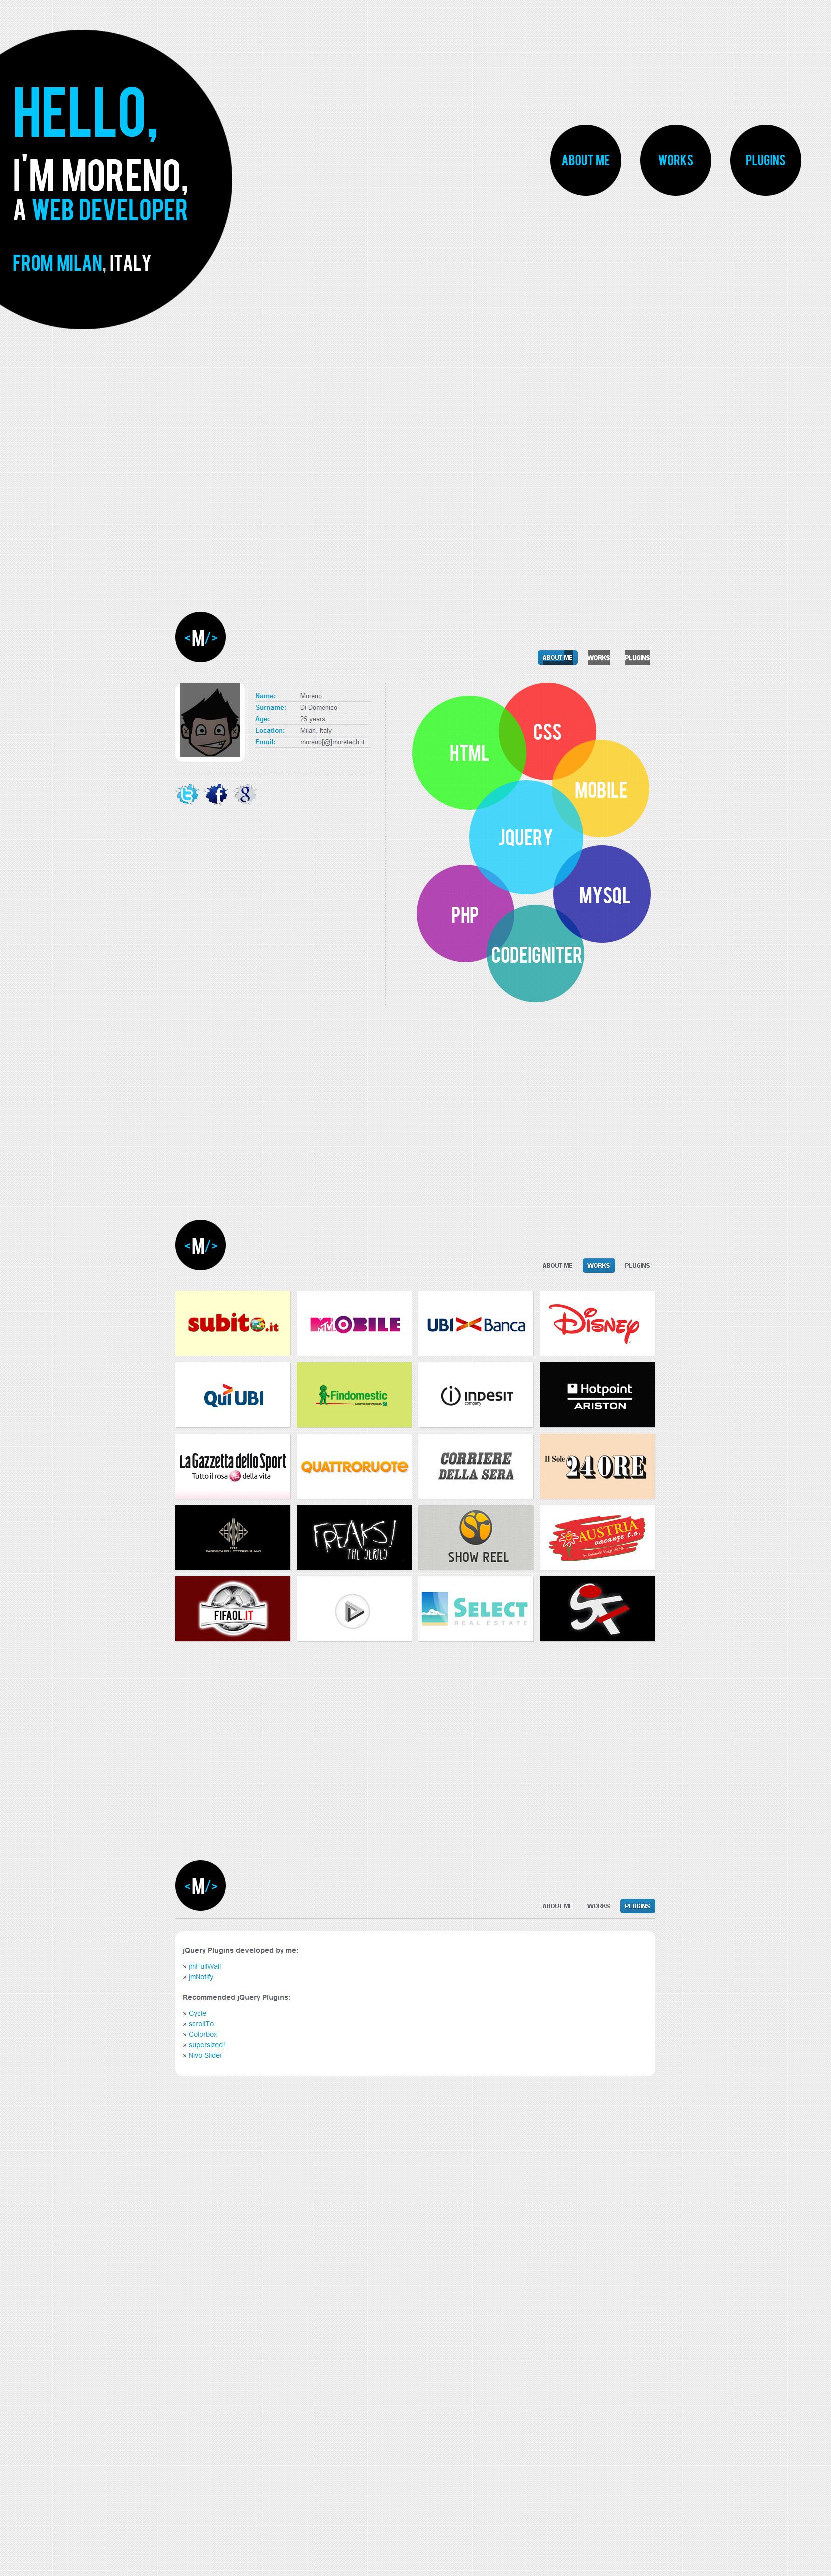 Moretech Website Screenshot